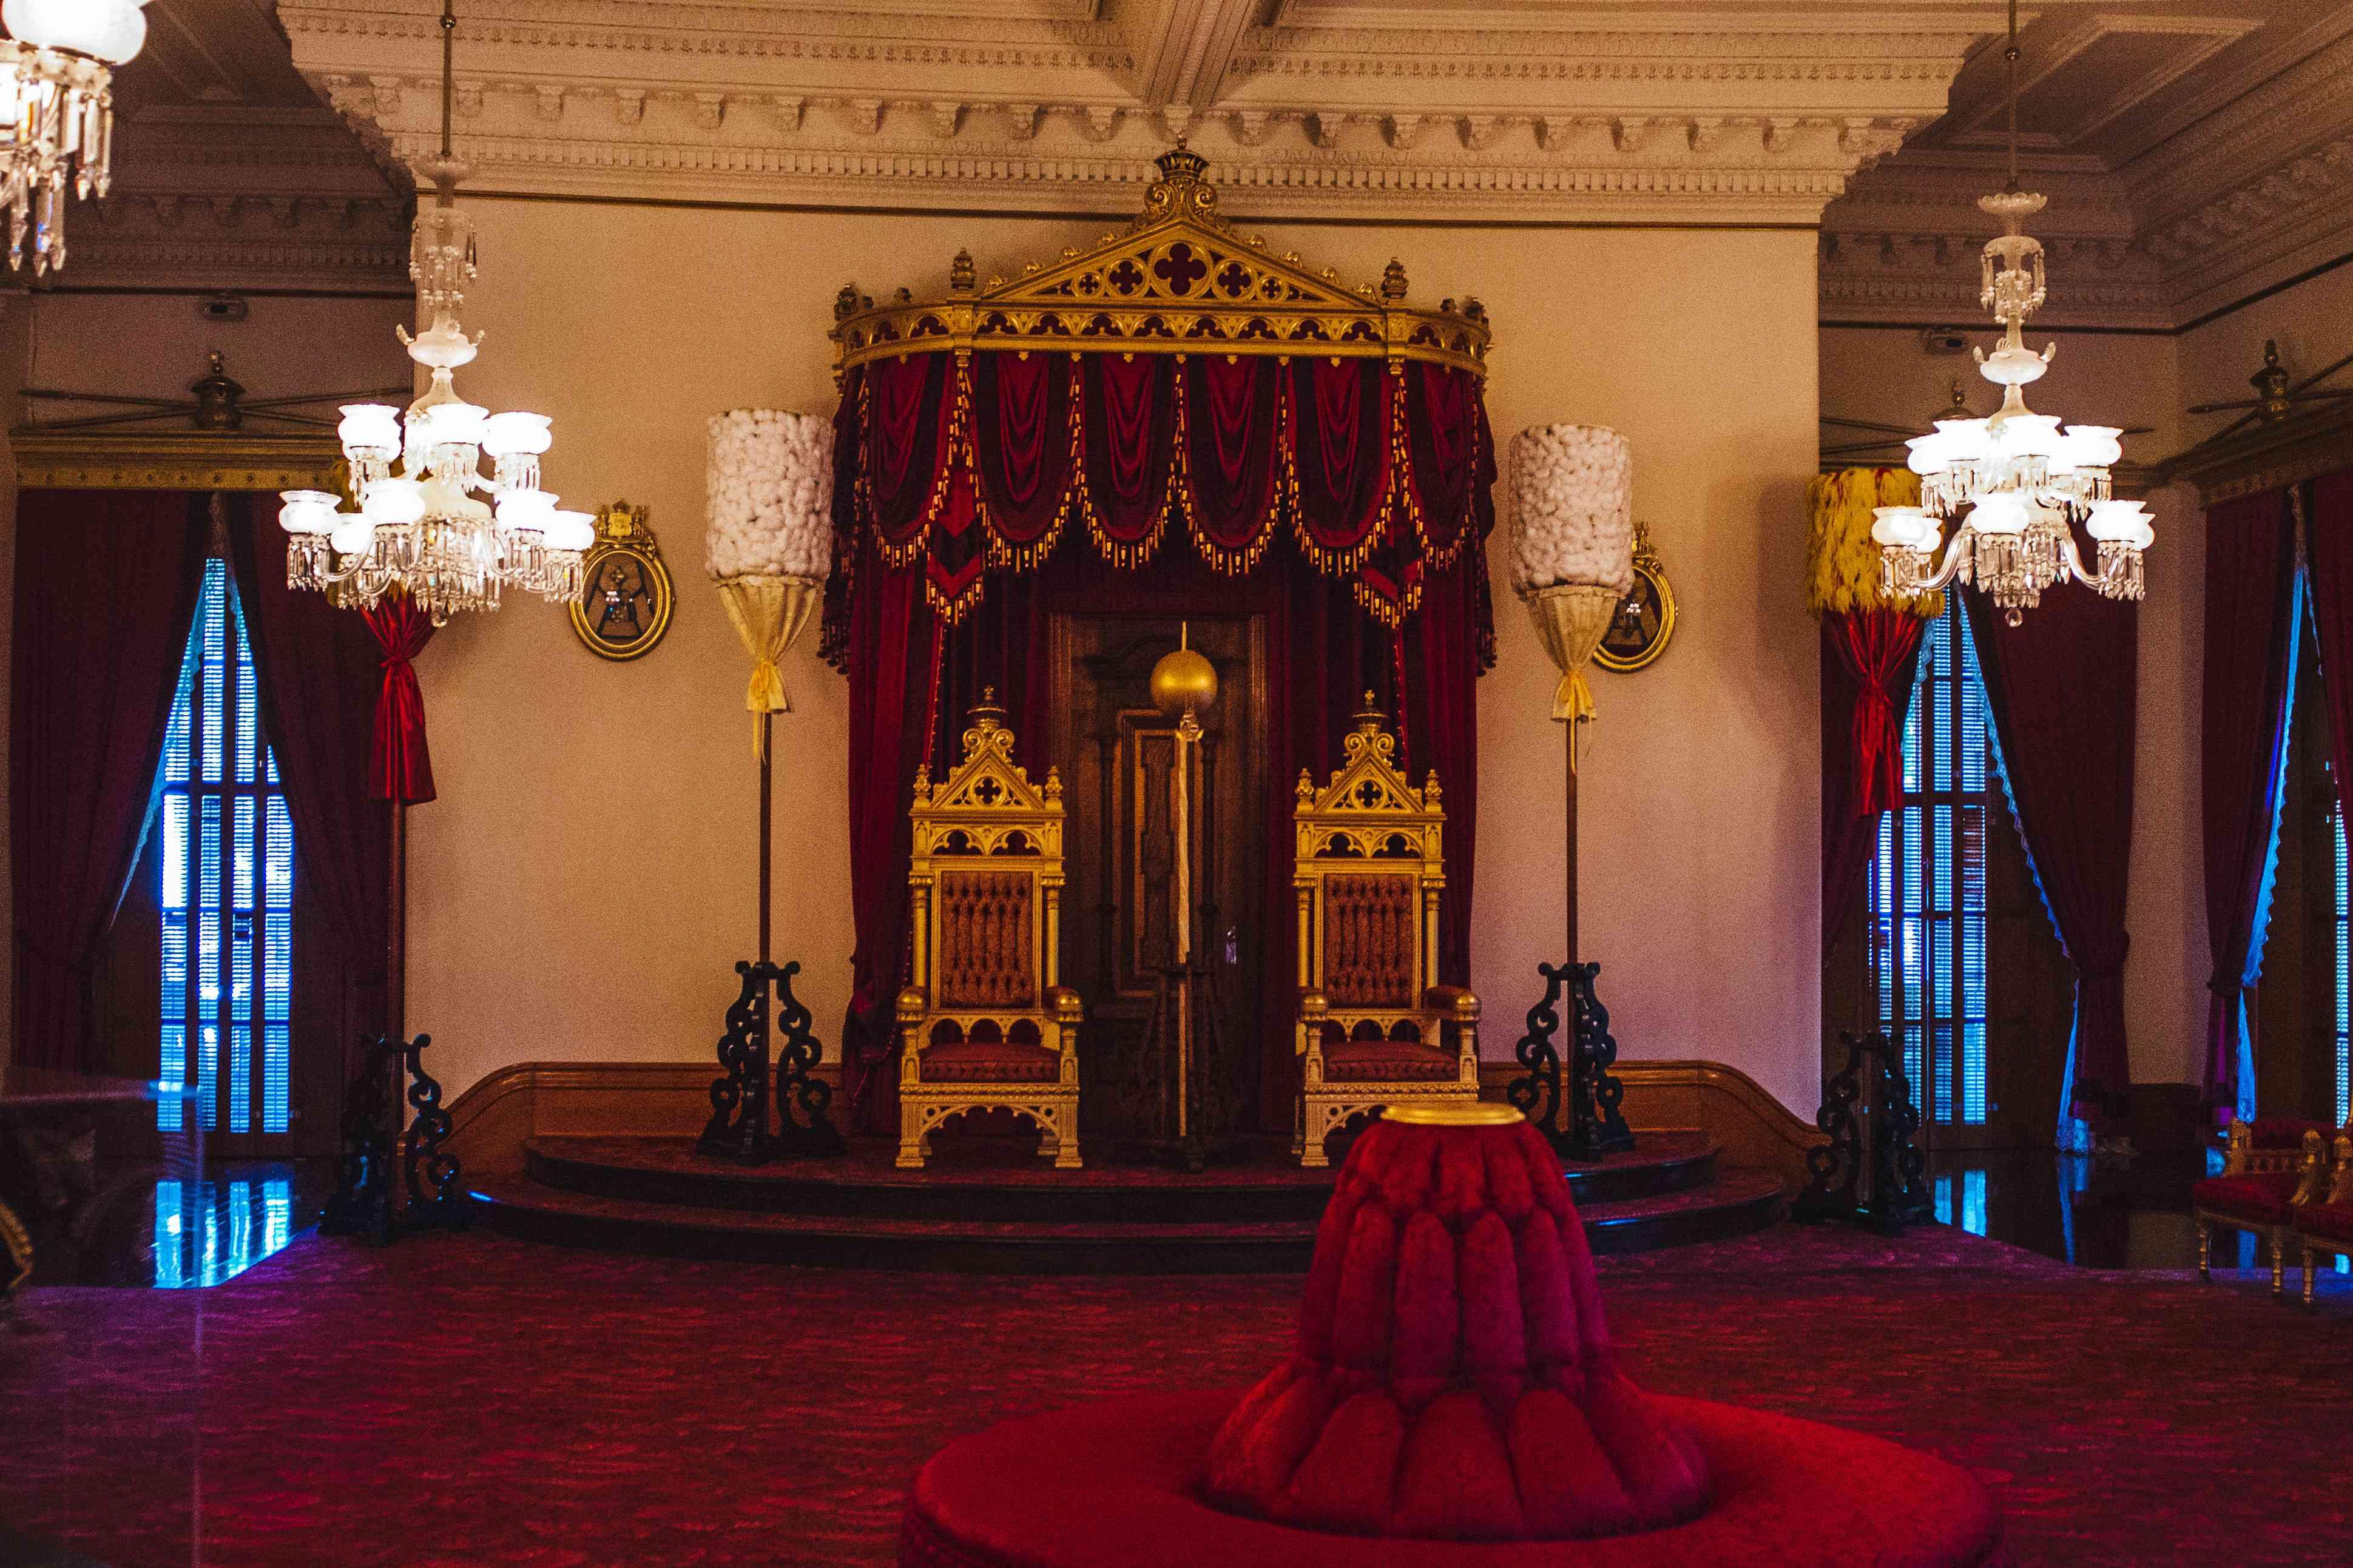 Interior of Iolani Palace